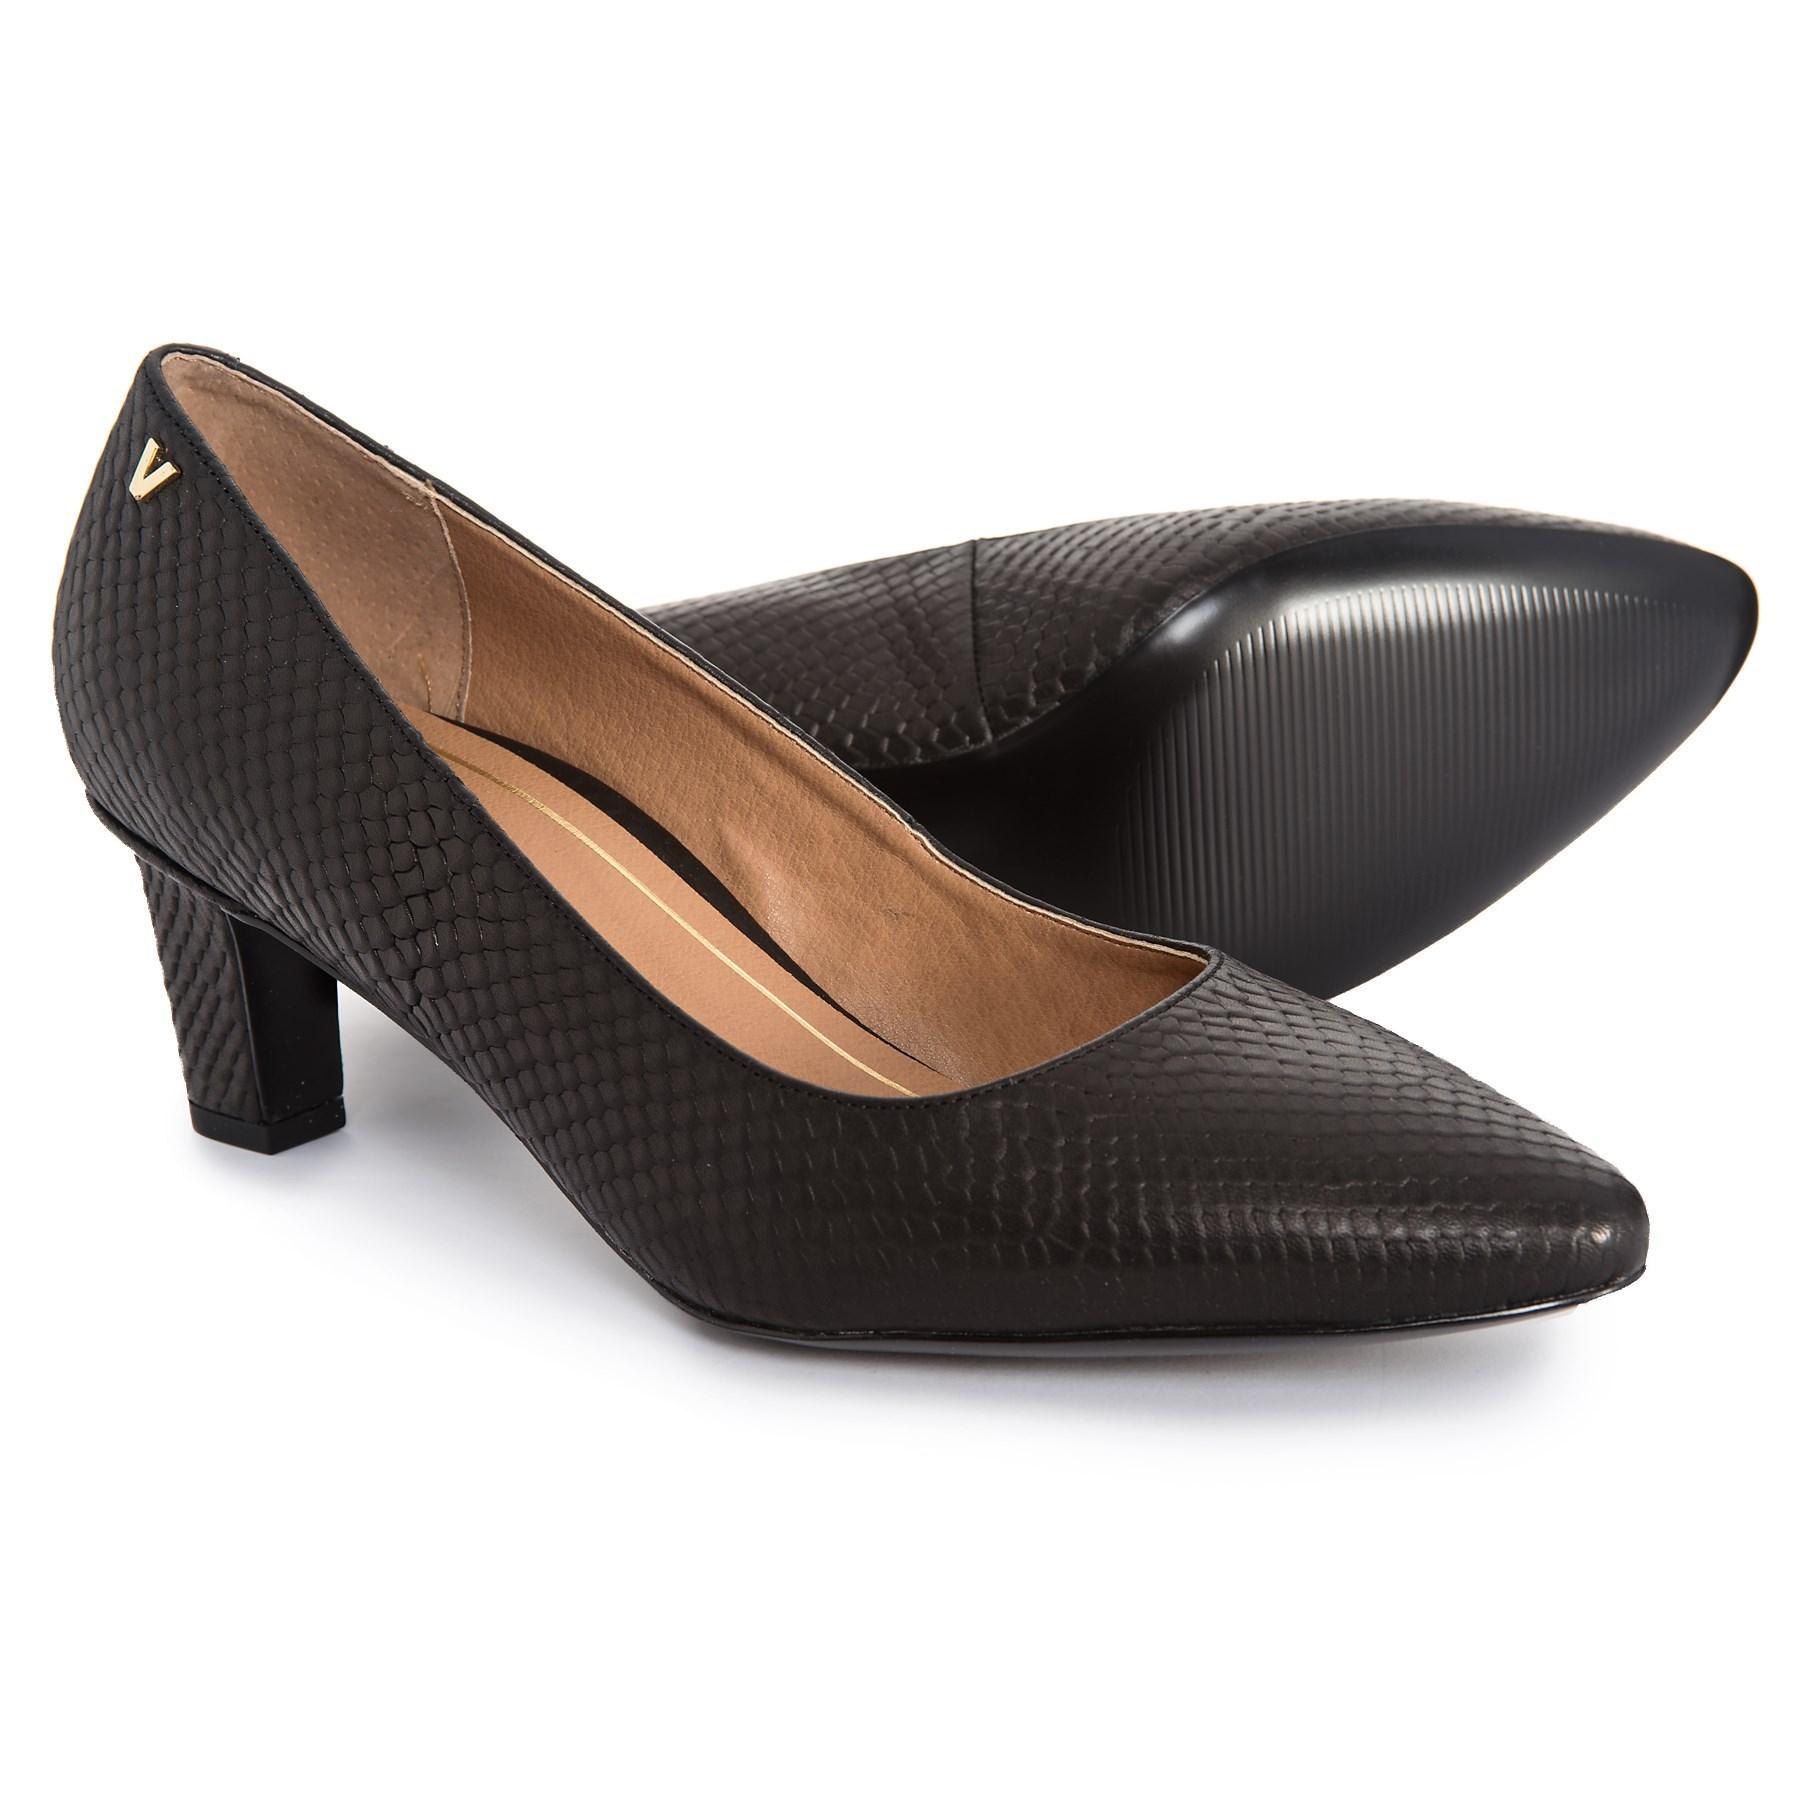 674032e0fc34 Lyst - Vionic Mia Block Heel Shoes in Black